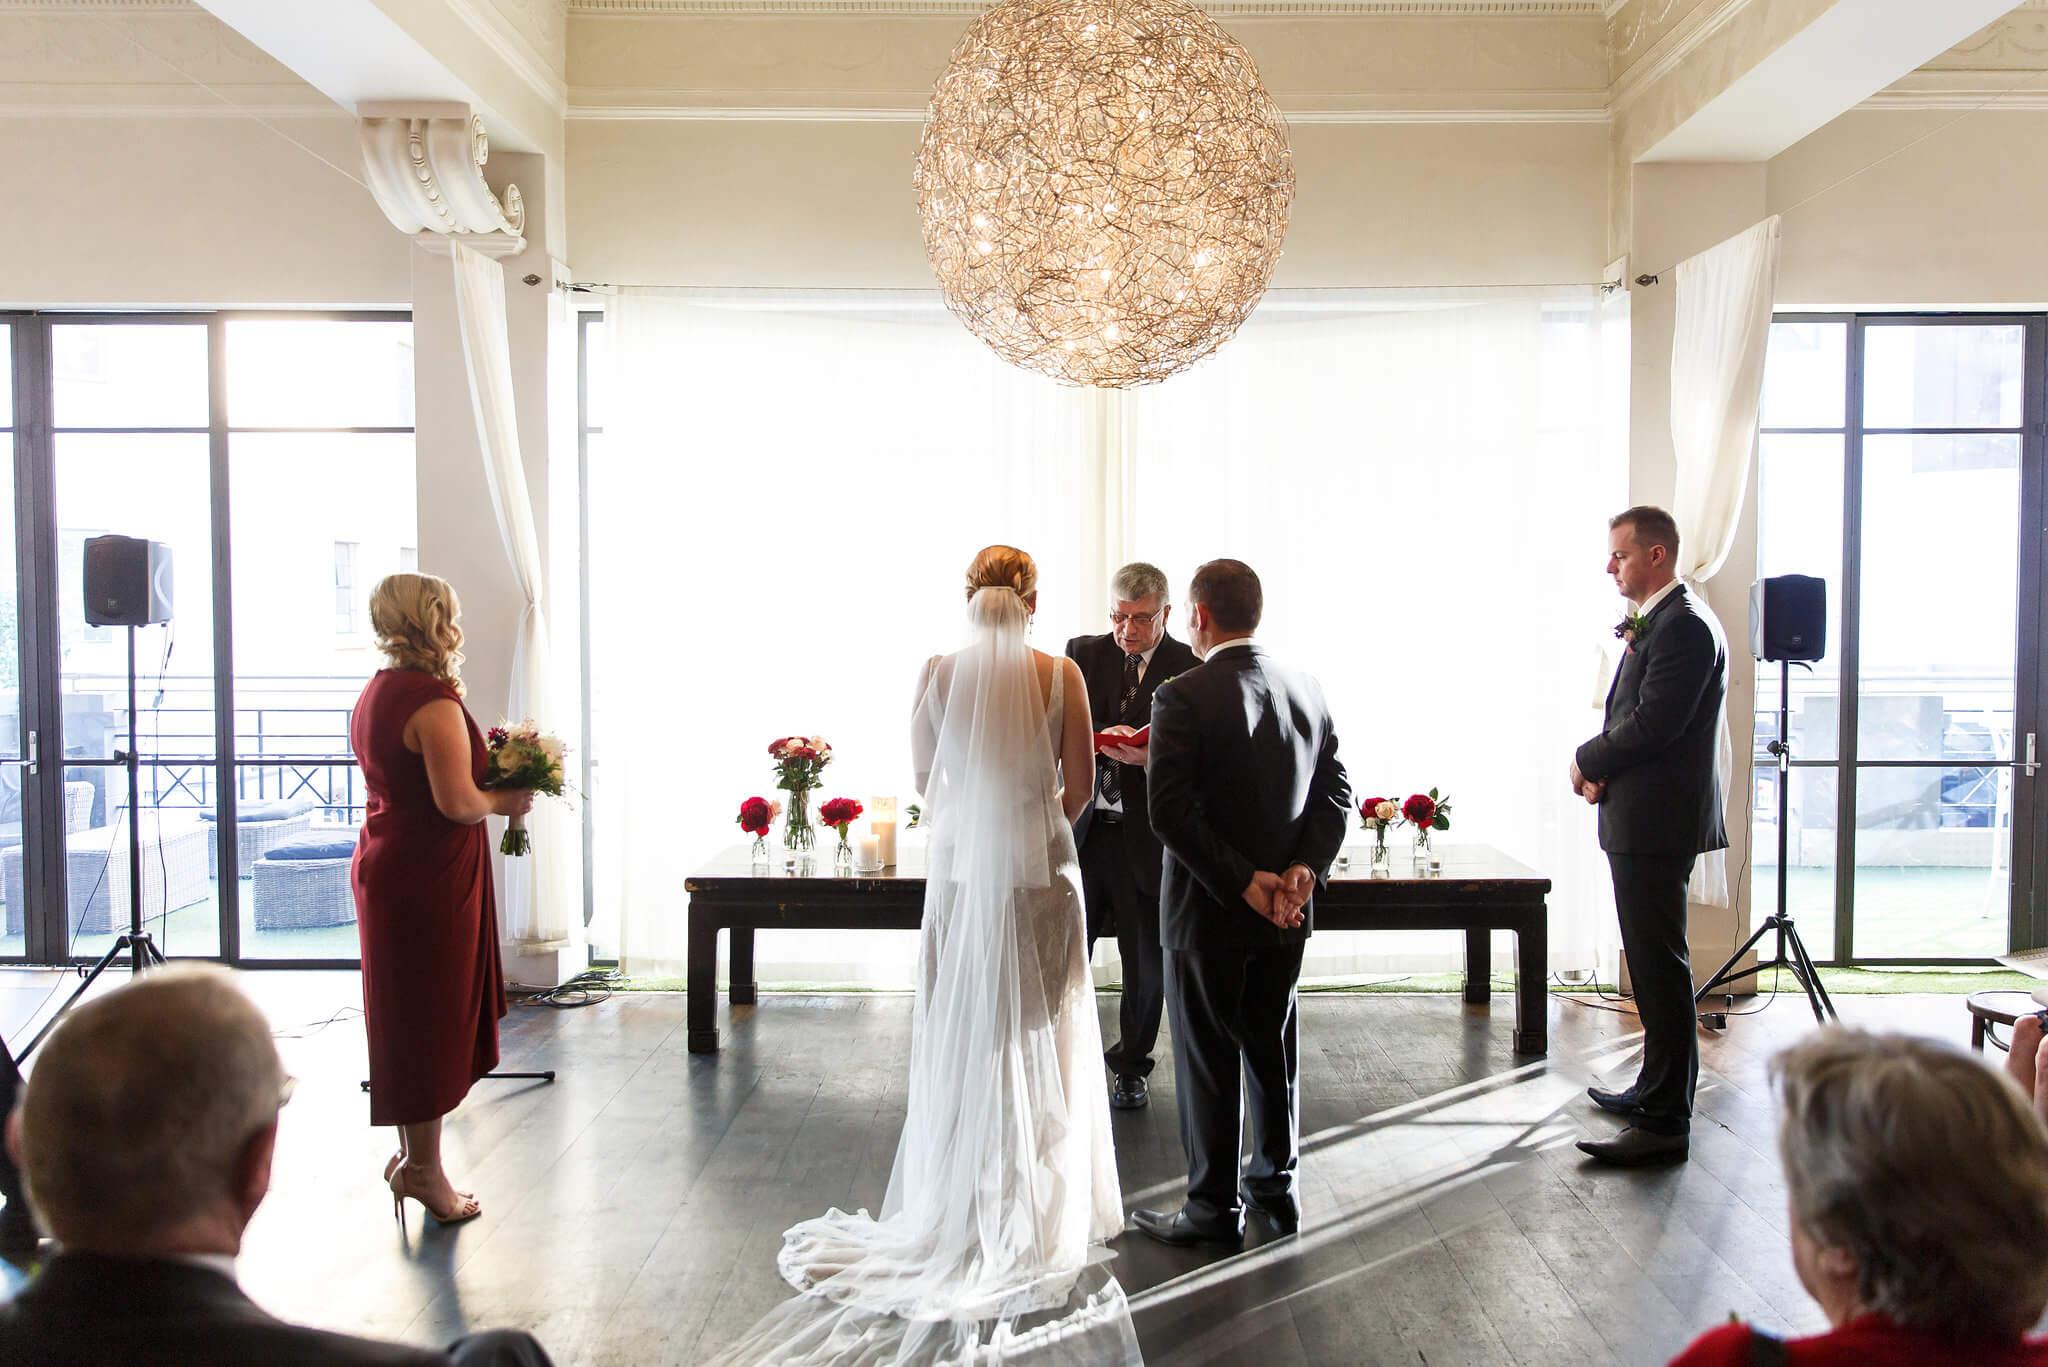 wedding ceremony at hotel richmond